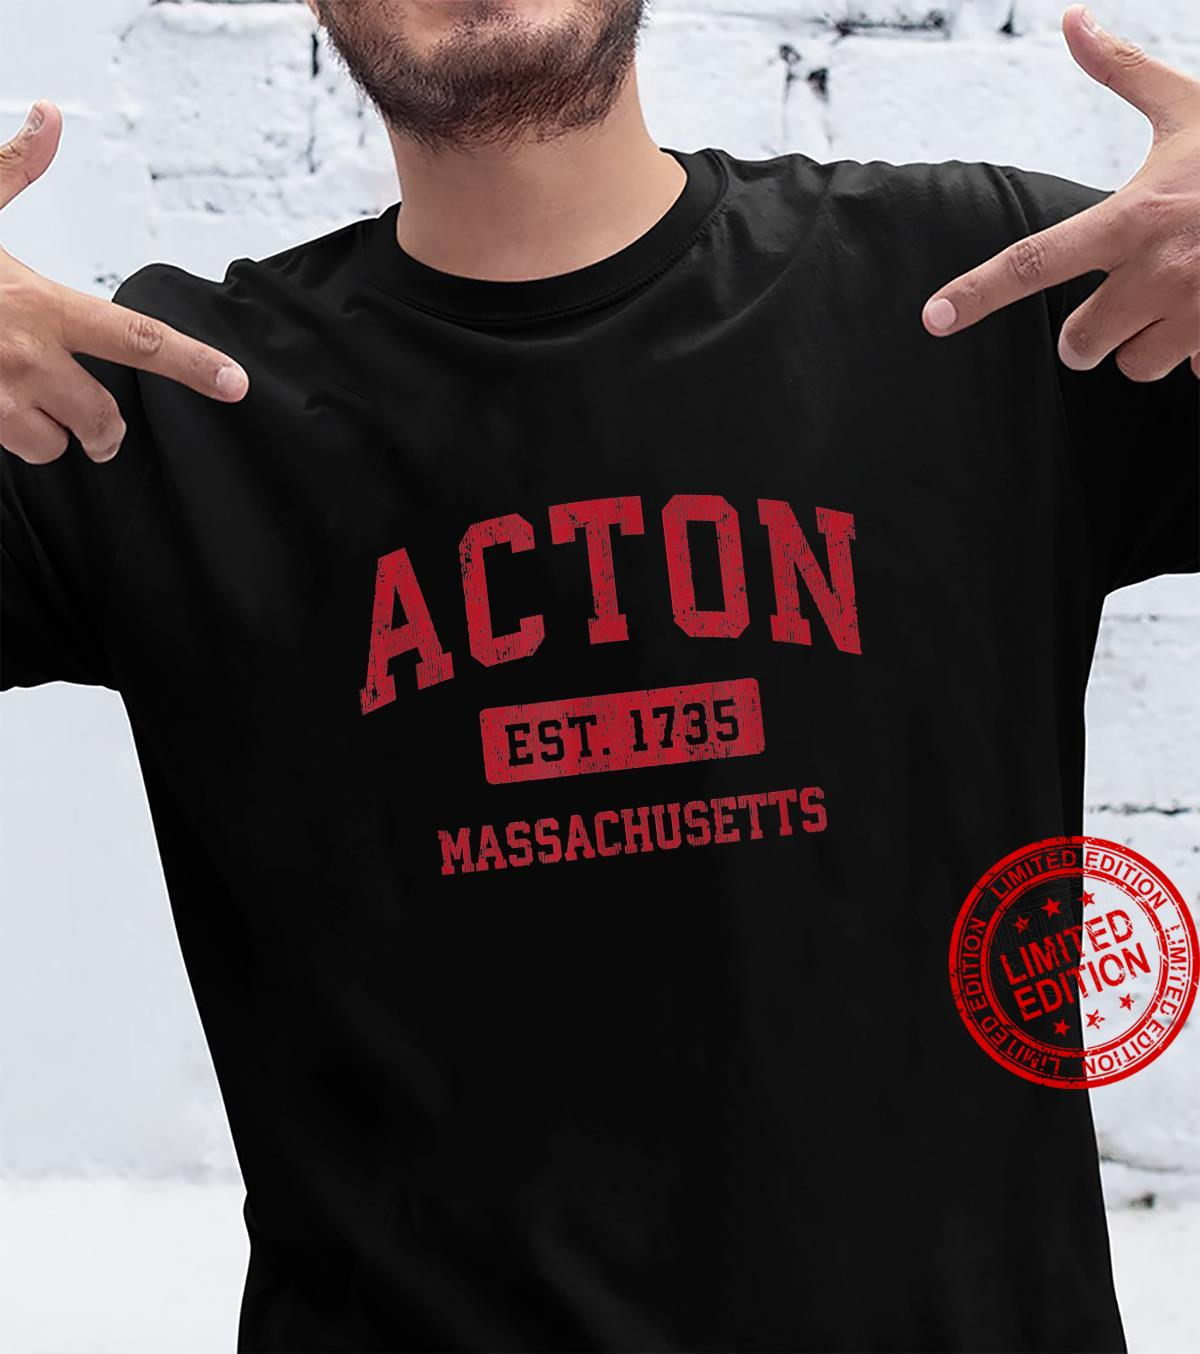 Acton Massachusetts MA Vintage Sports Design Red Design Shirt